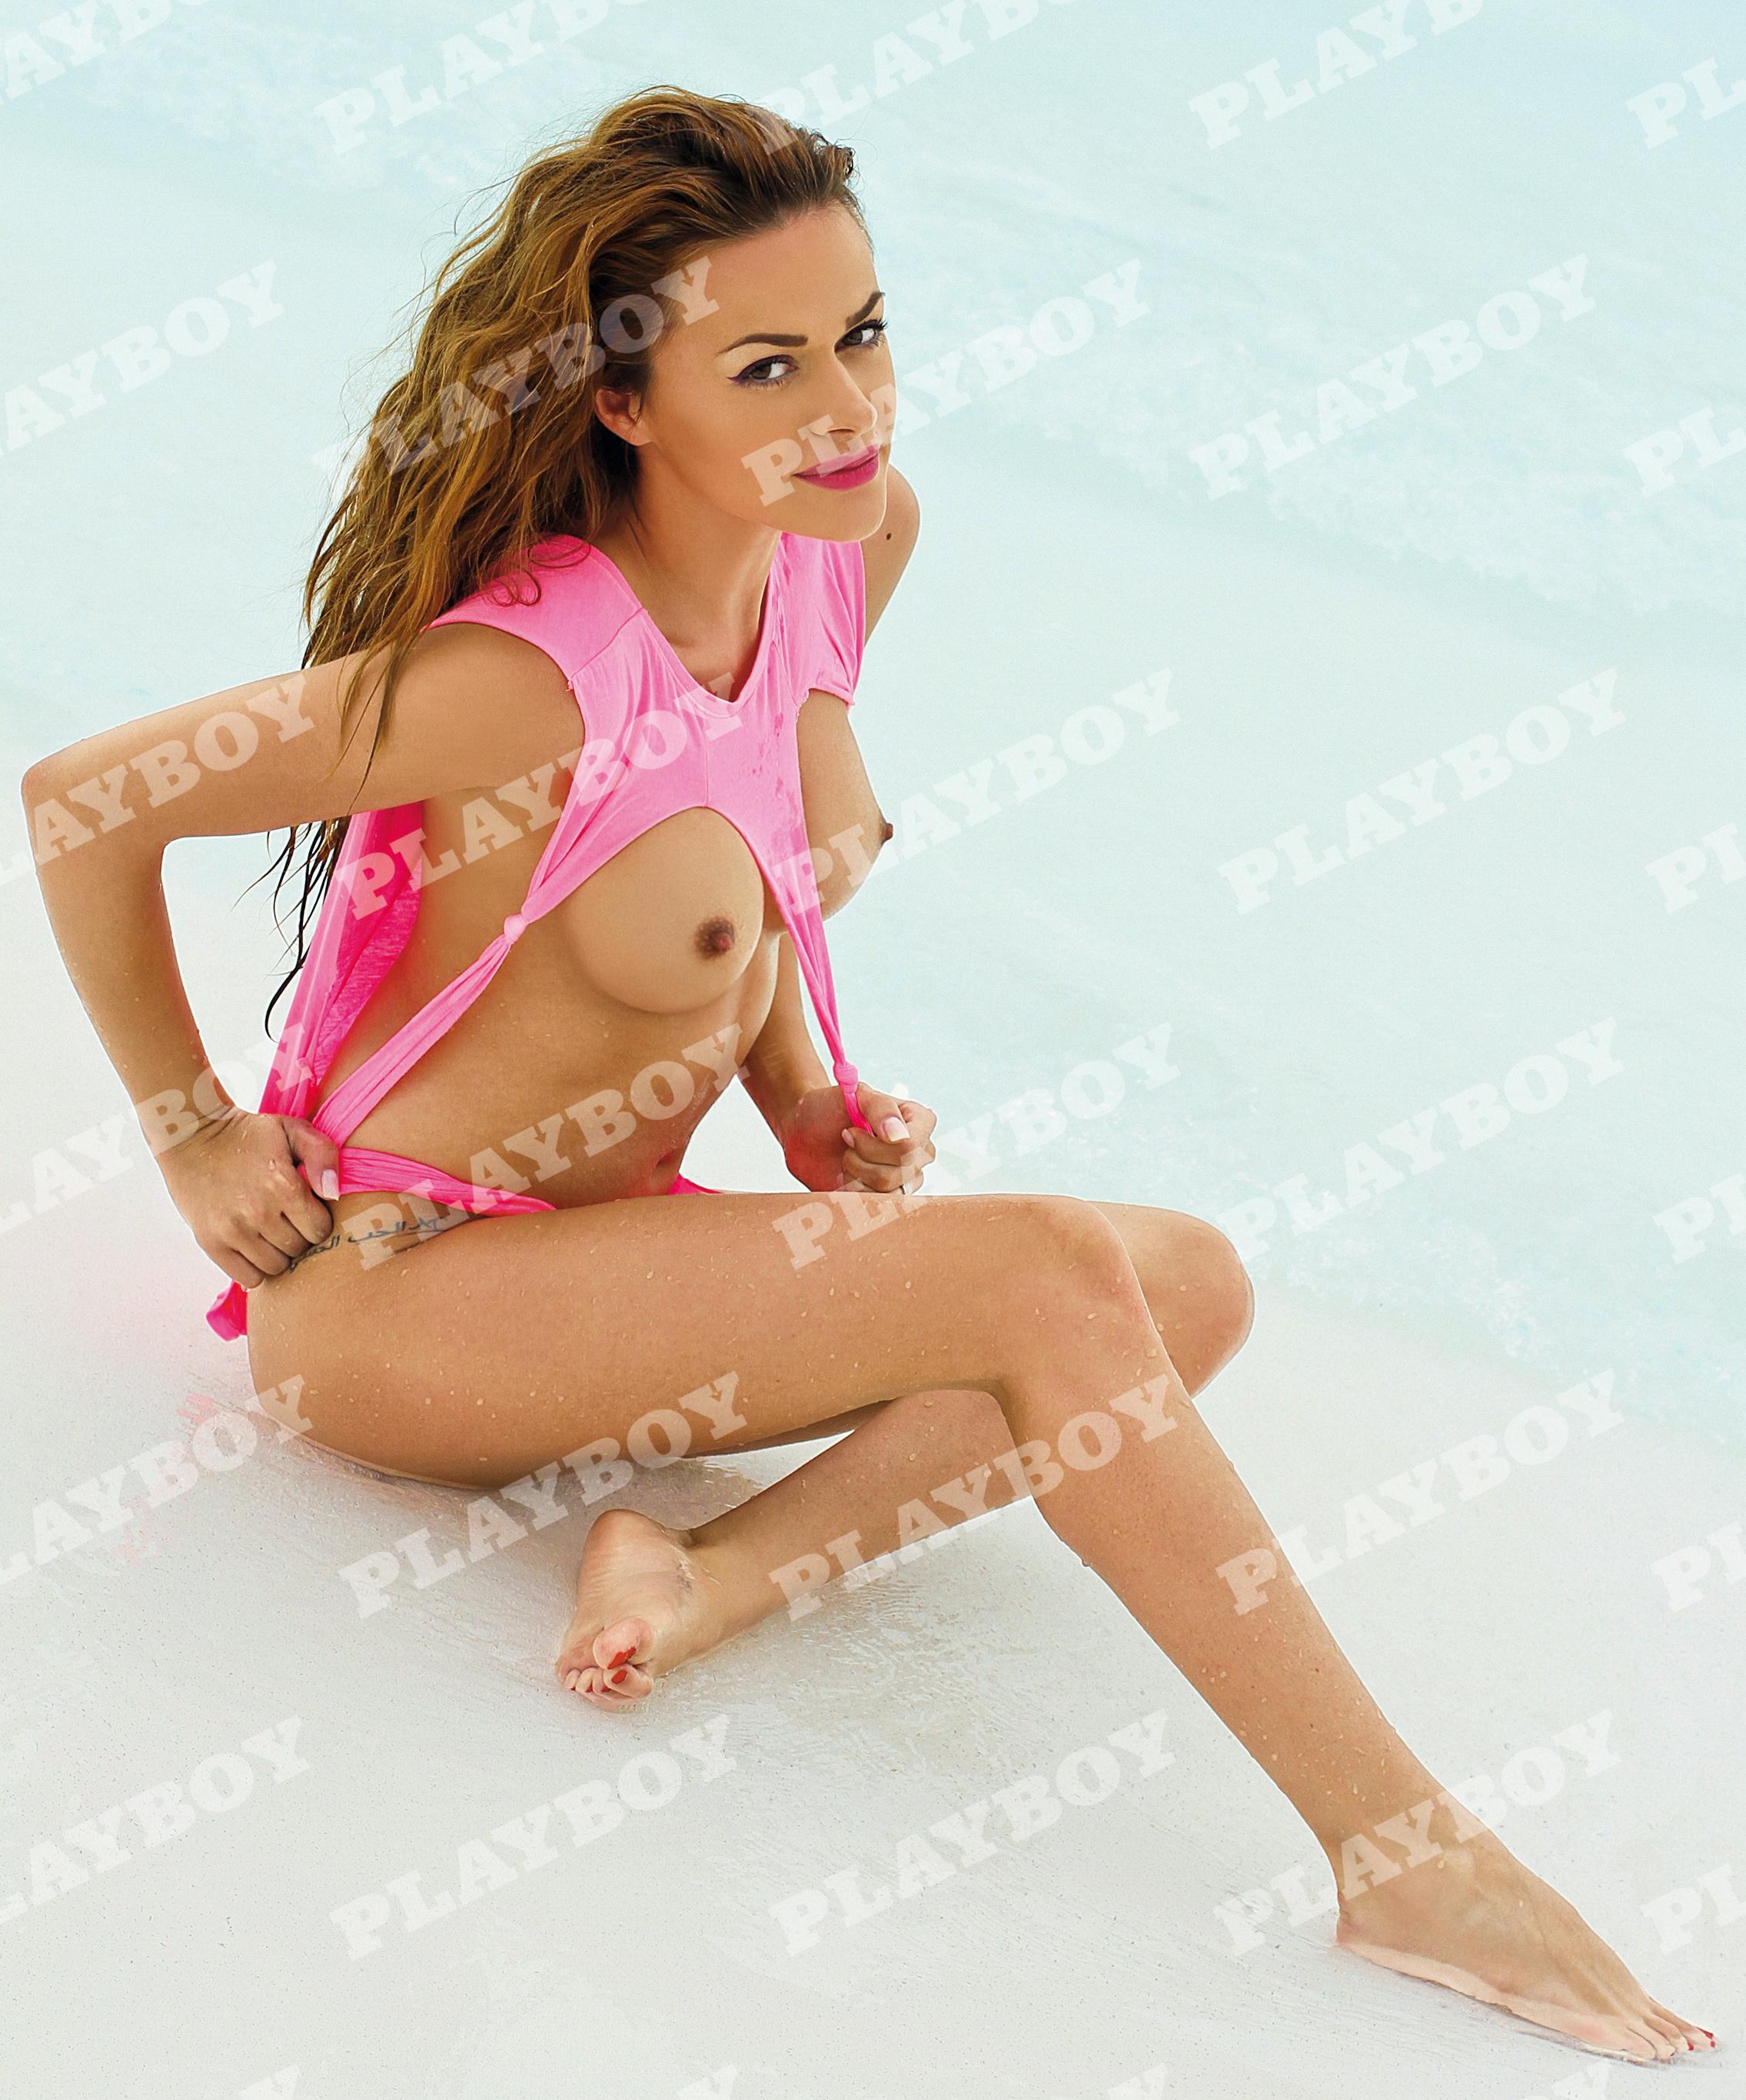 Rellys a aparut in cel mai recent numar al revistei Playboy